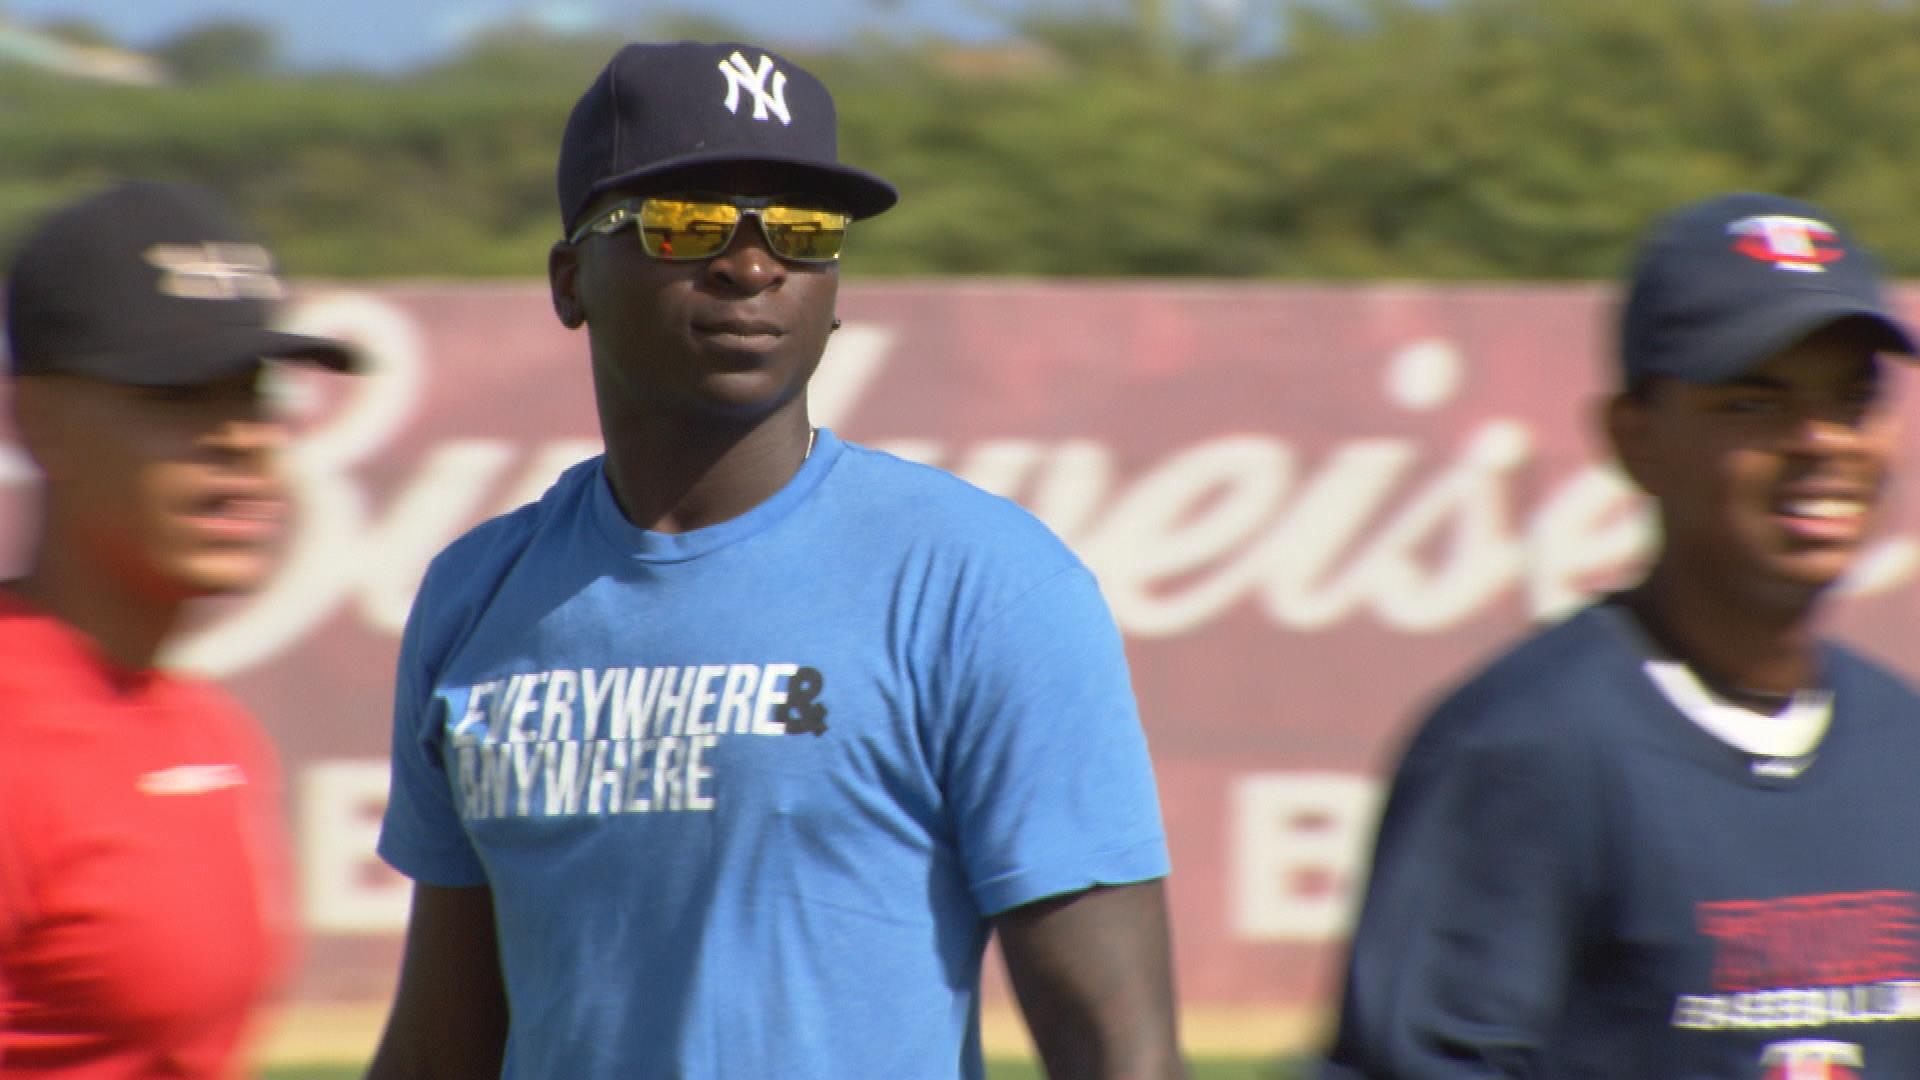 Yankees shortstop Didi Gregorious